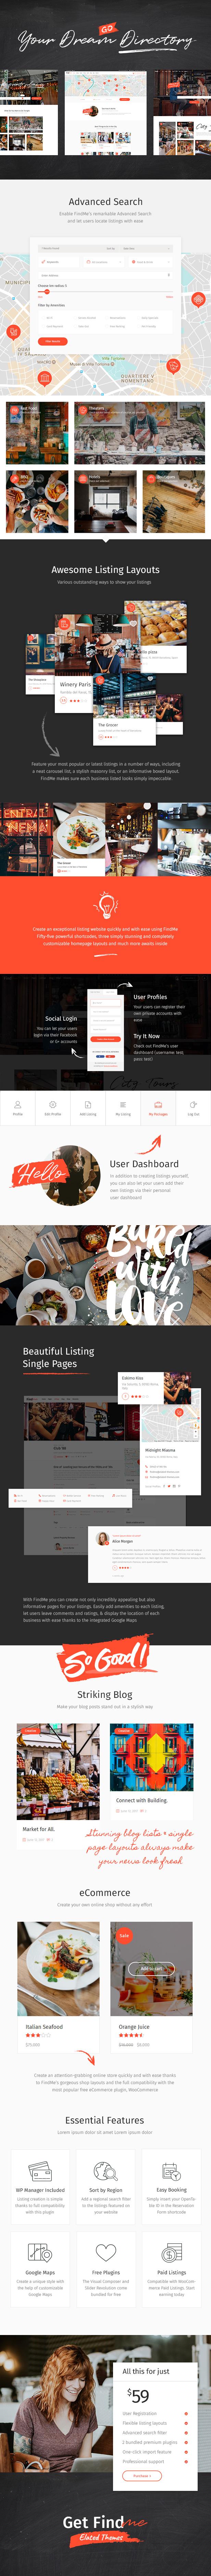 FindMe - Urban Directory Listing Theme - 1